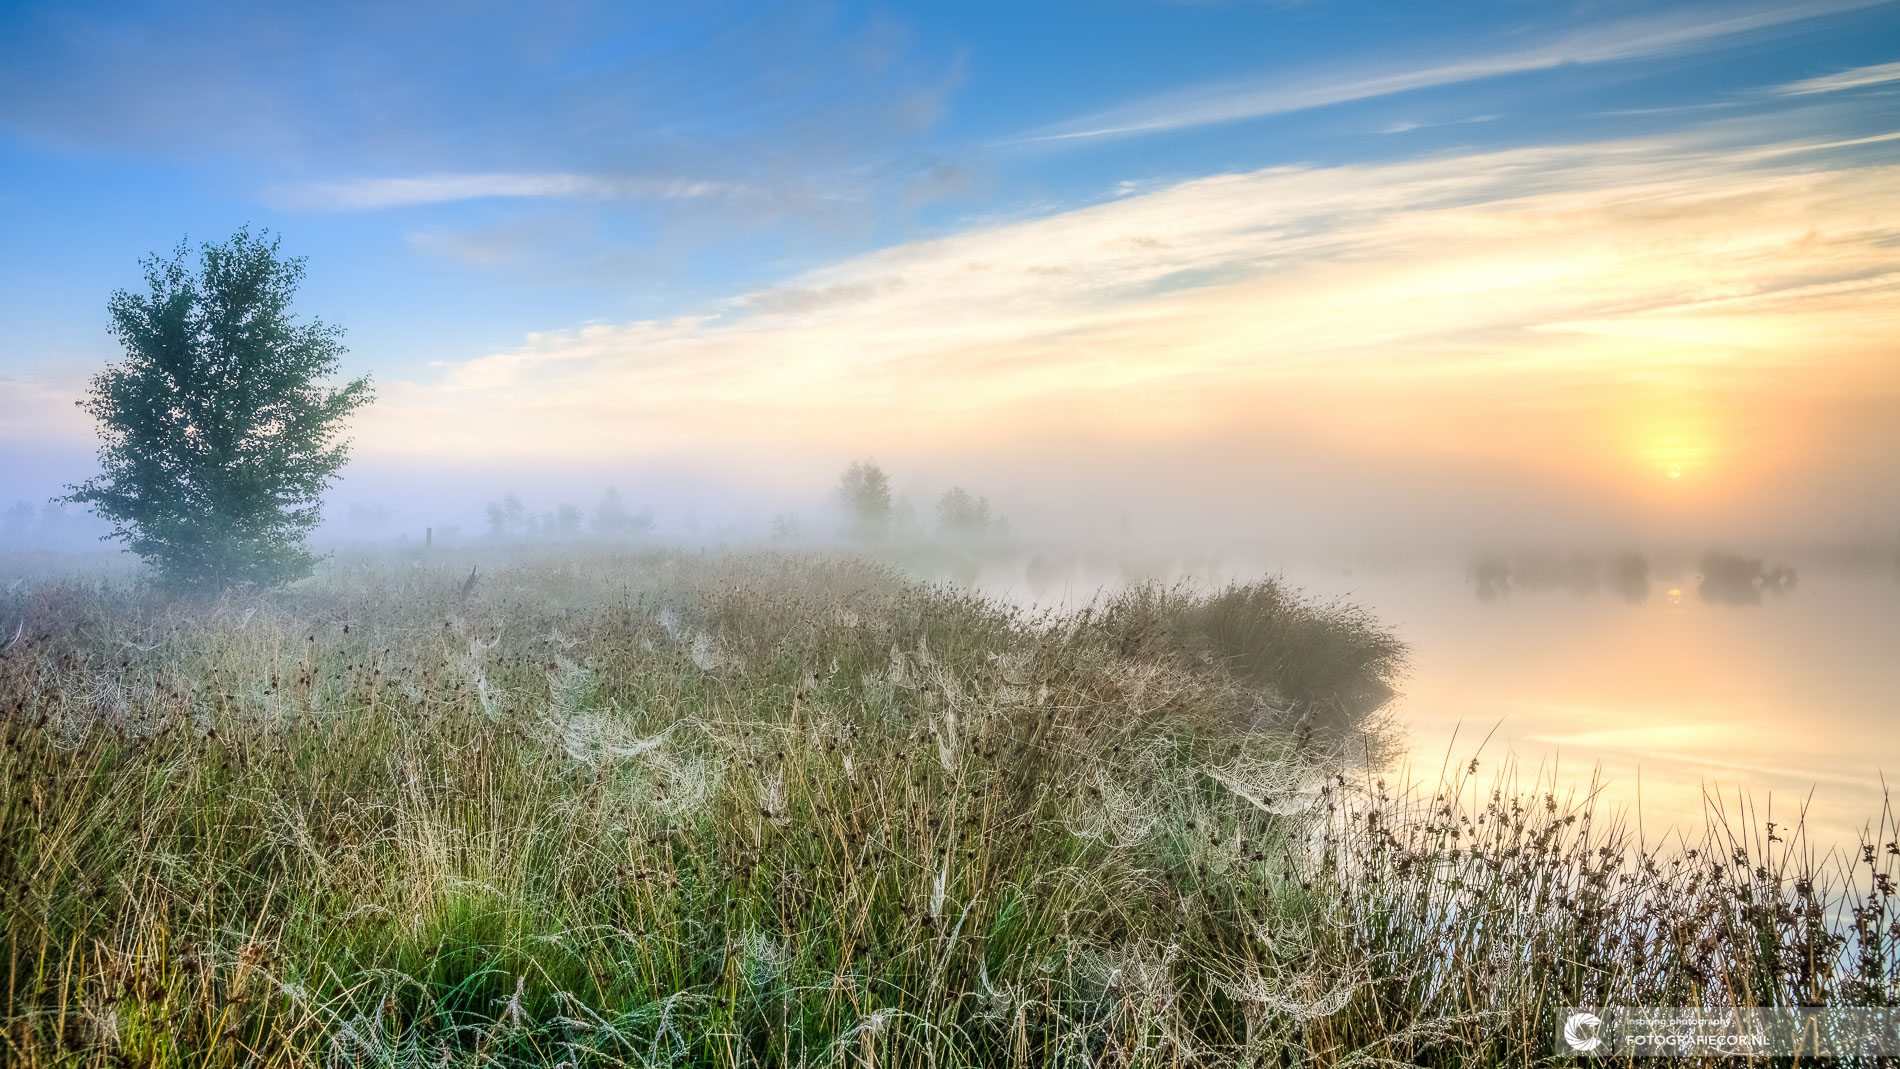 Dwingelderveld | zonsopkomst mistig vennen | Natuurfotograaf | Nederland